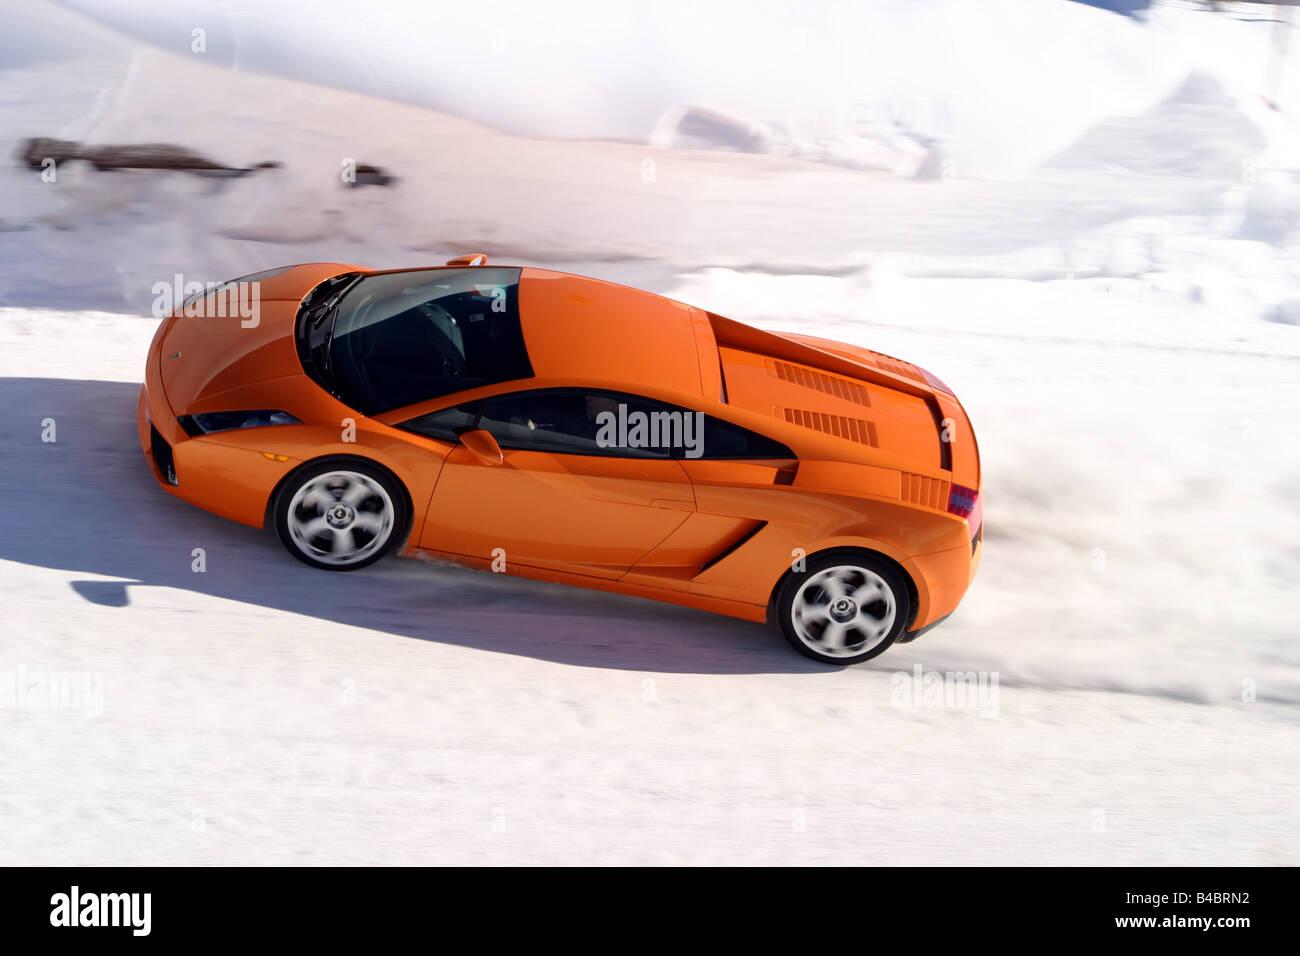 Car, Lamborghini Gallardo, Roadster, Orange , Model Year 2003 , Coupe/